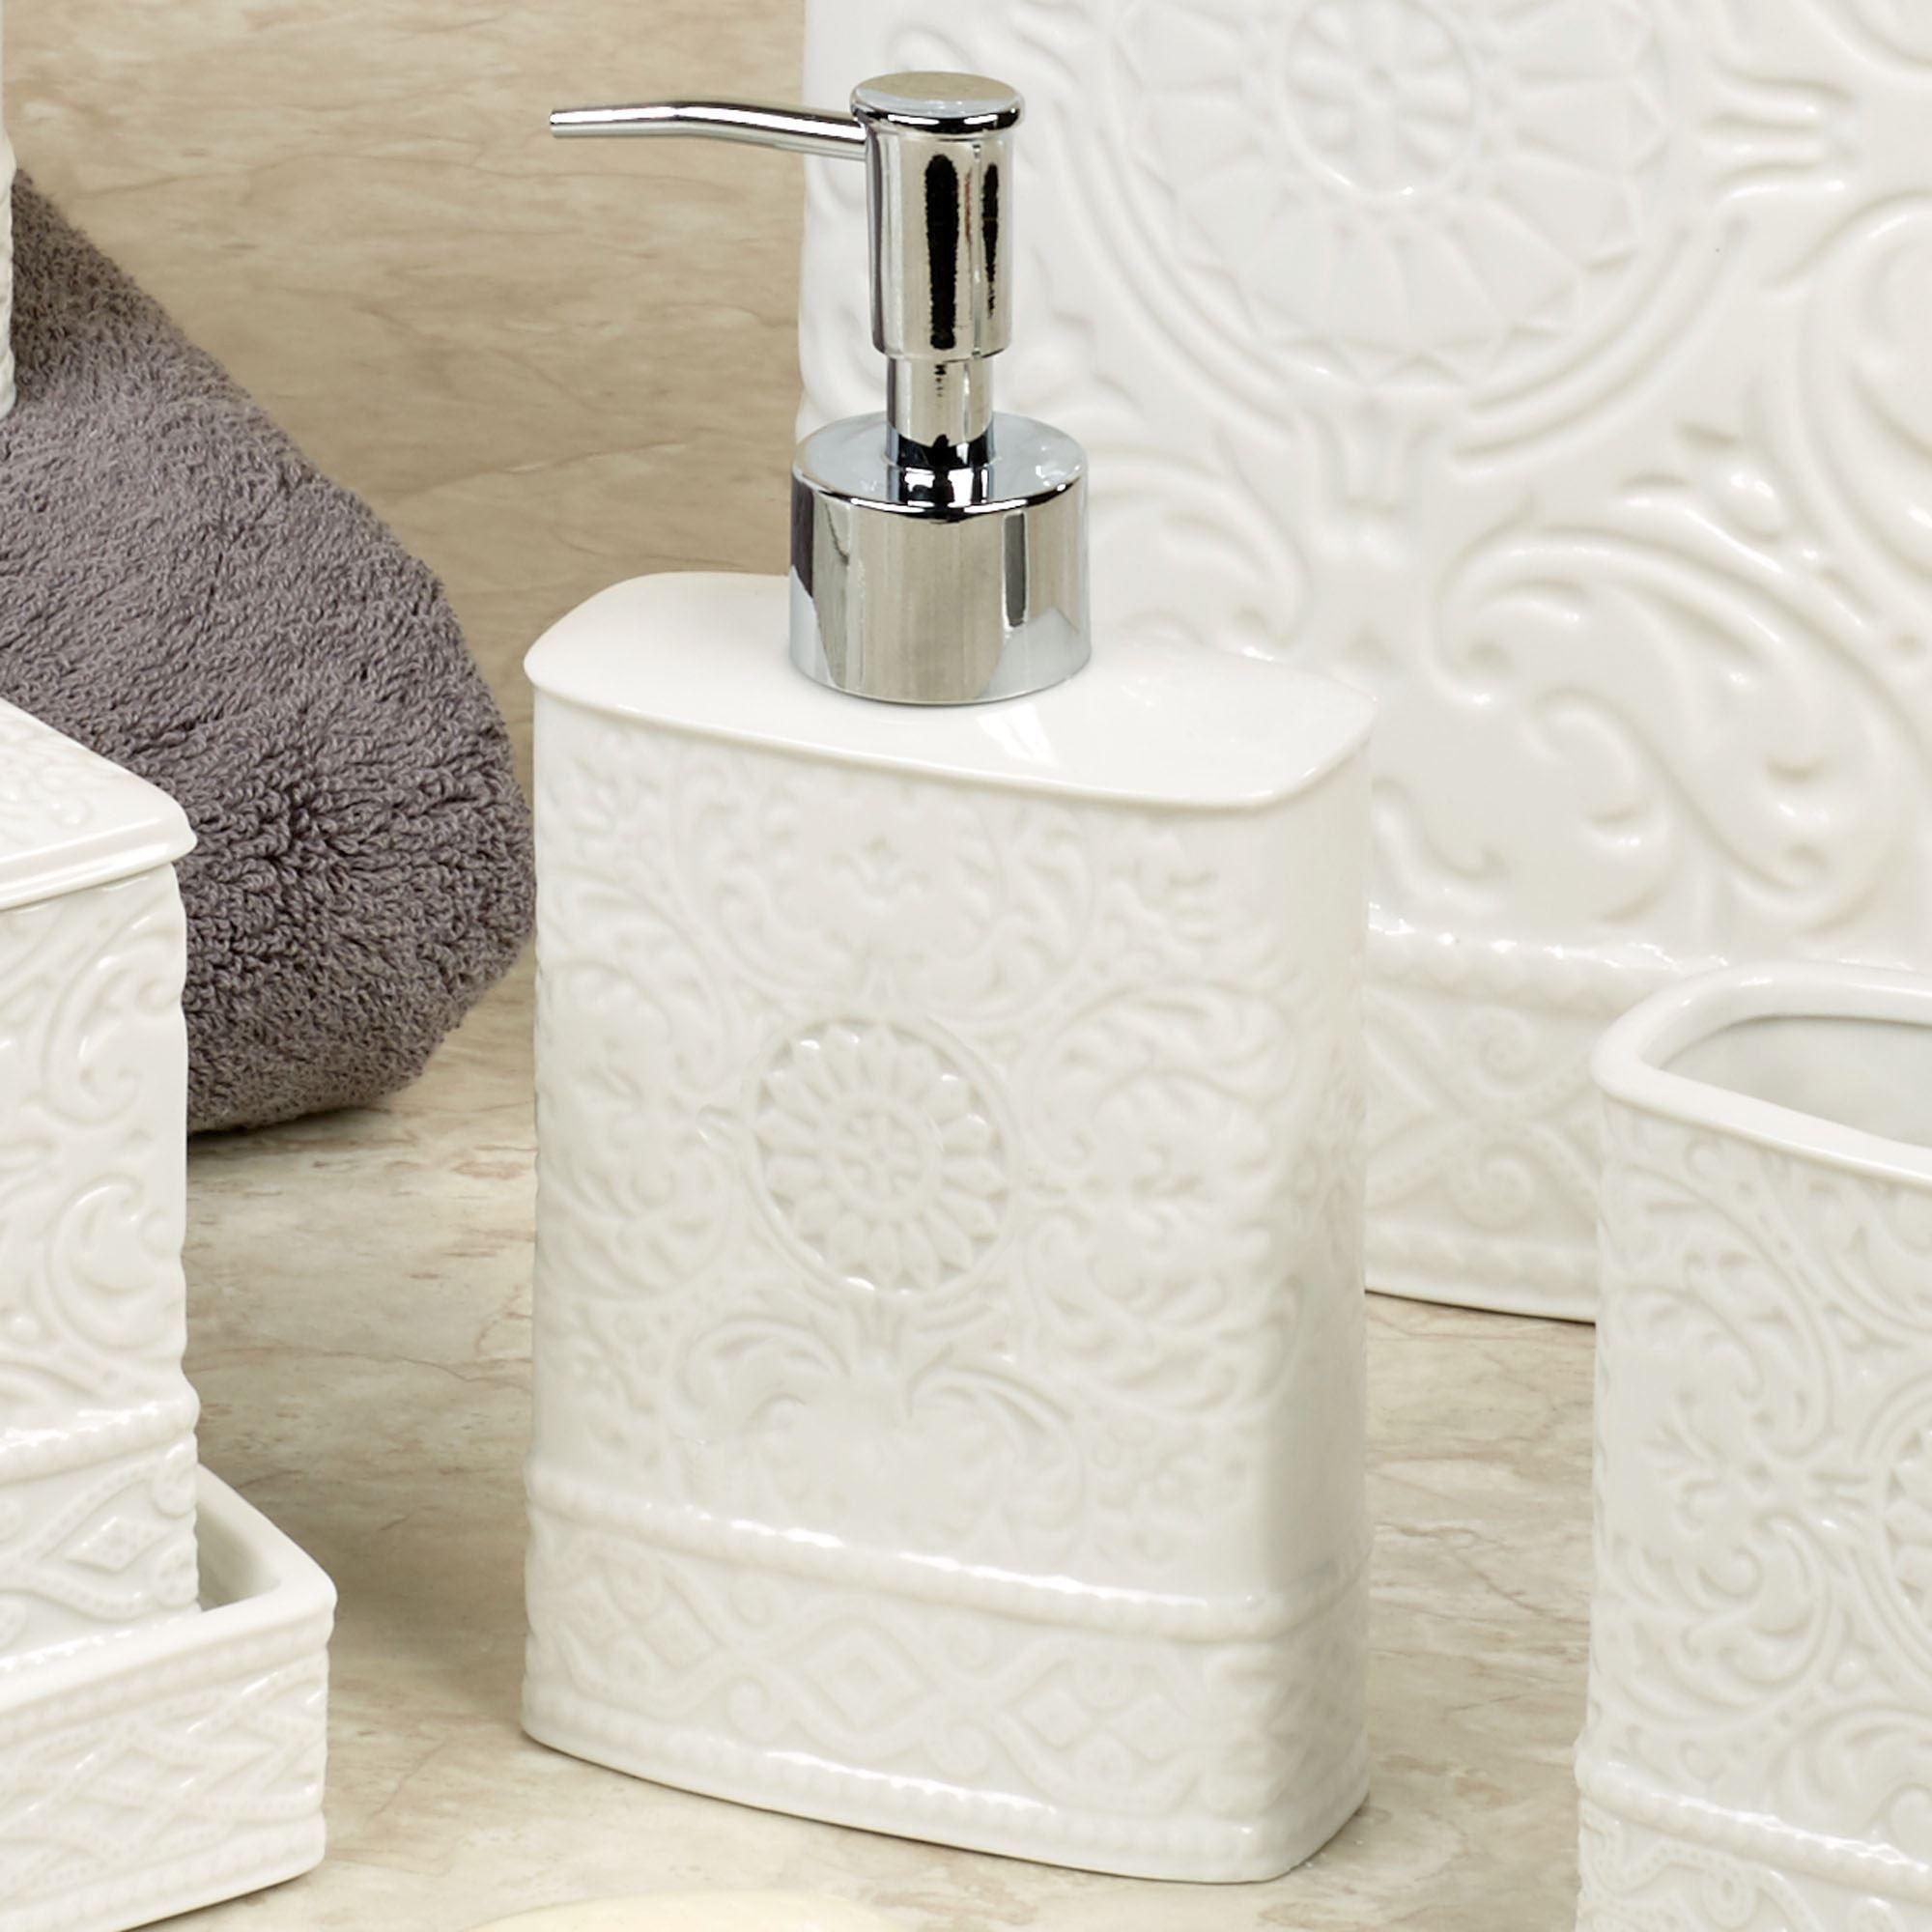 Damask Ivory Porcelain Bath Accessories